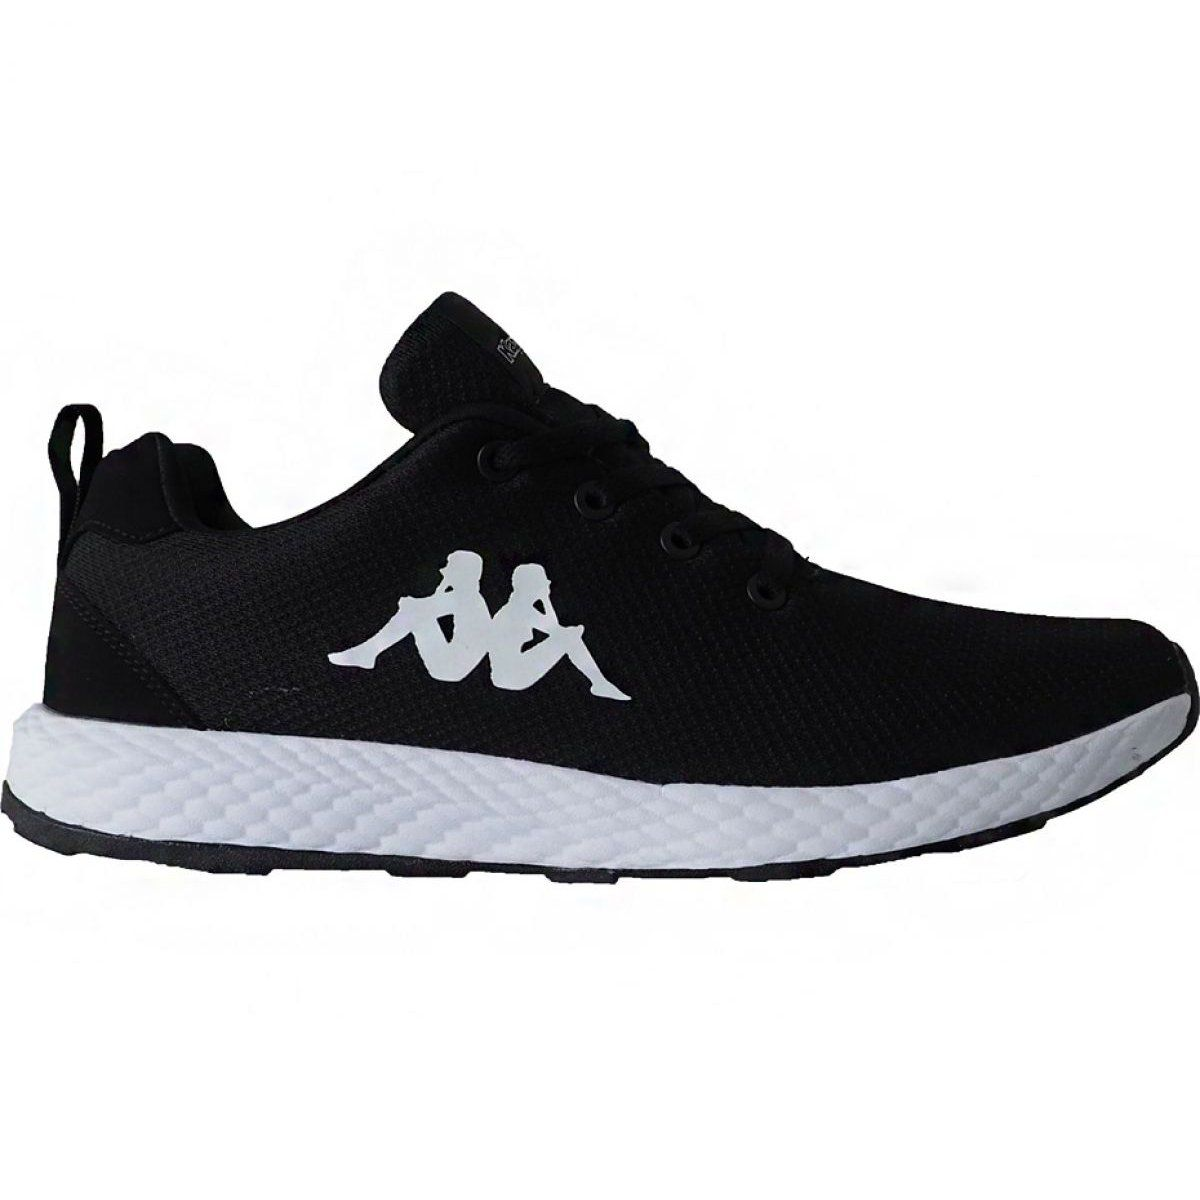 Buty Kappa Banjo 1 2 242703 1110 Czarne Black Shoes Shoes Stylish Shoes